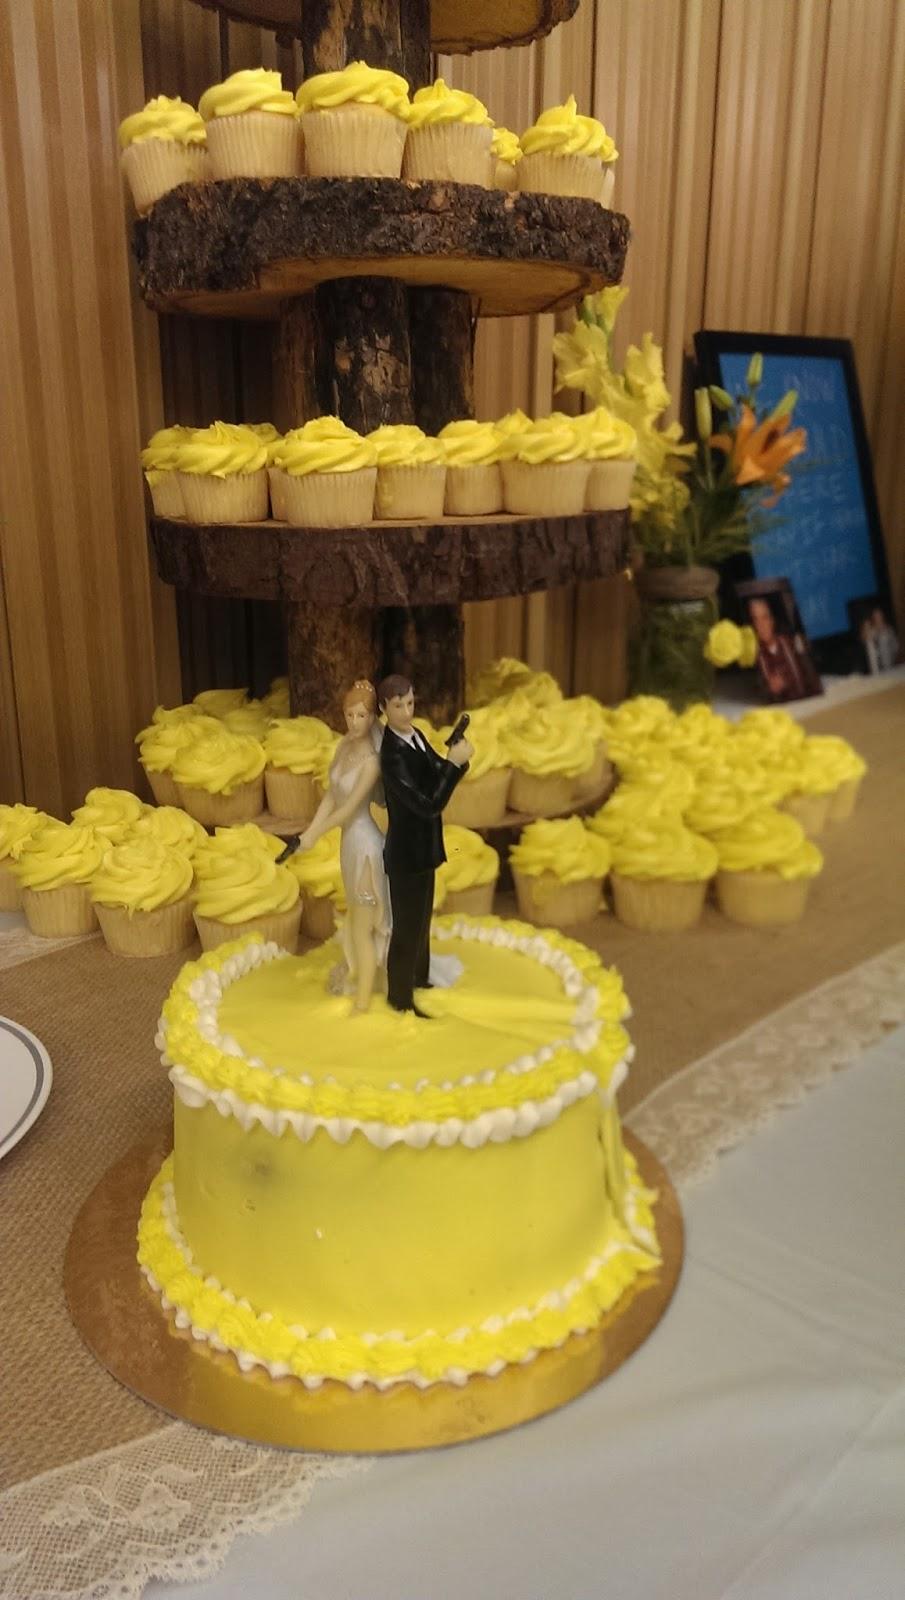 Bonnie And Clyde Wedding Cake - CakeCentral.com  |Bonnie And Clyde Cakes